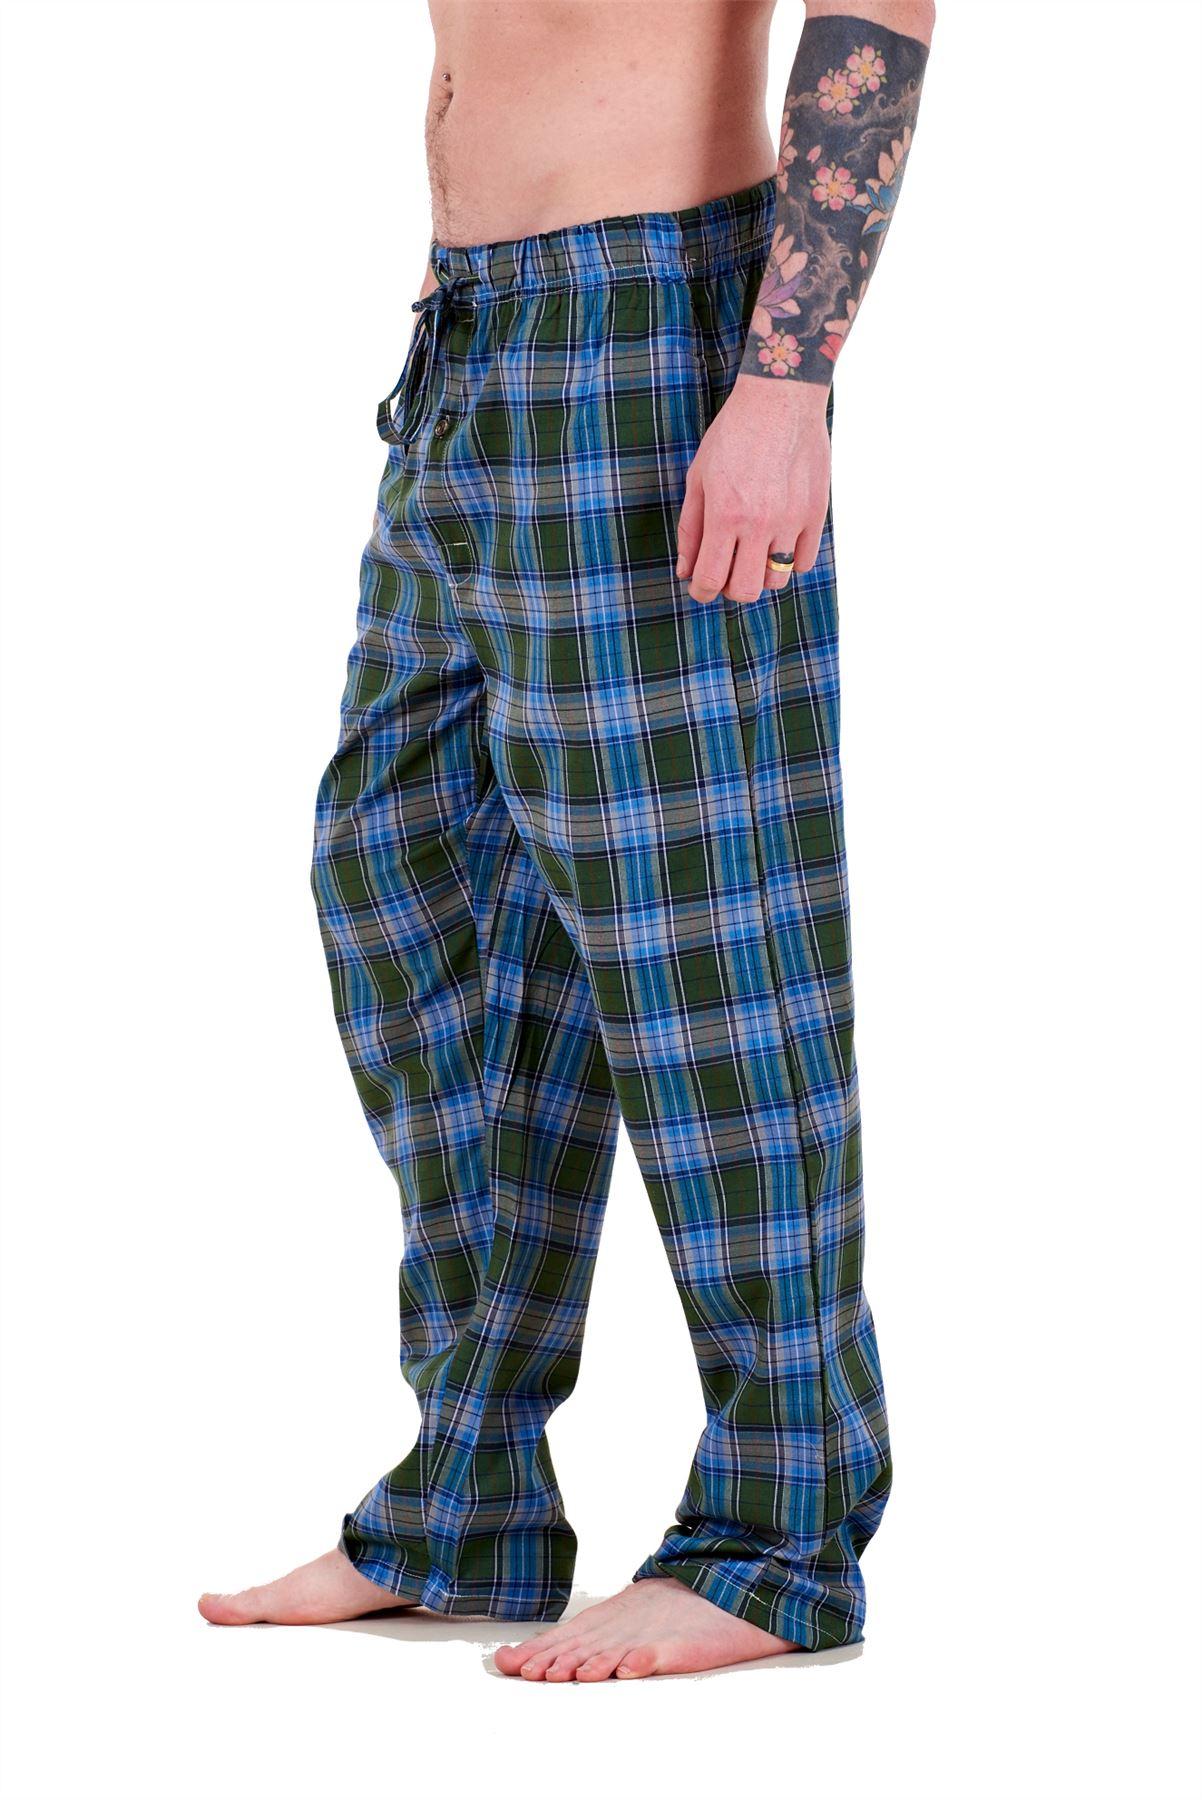 Mens-Pyjama-Bottoms-Rich-Cotton-Woven-Check-Lounge-Pant-Nightwear-Big-3XL-to-5XL Indexbild 33